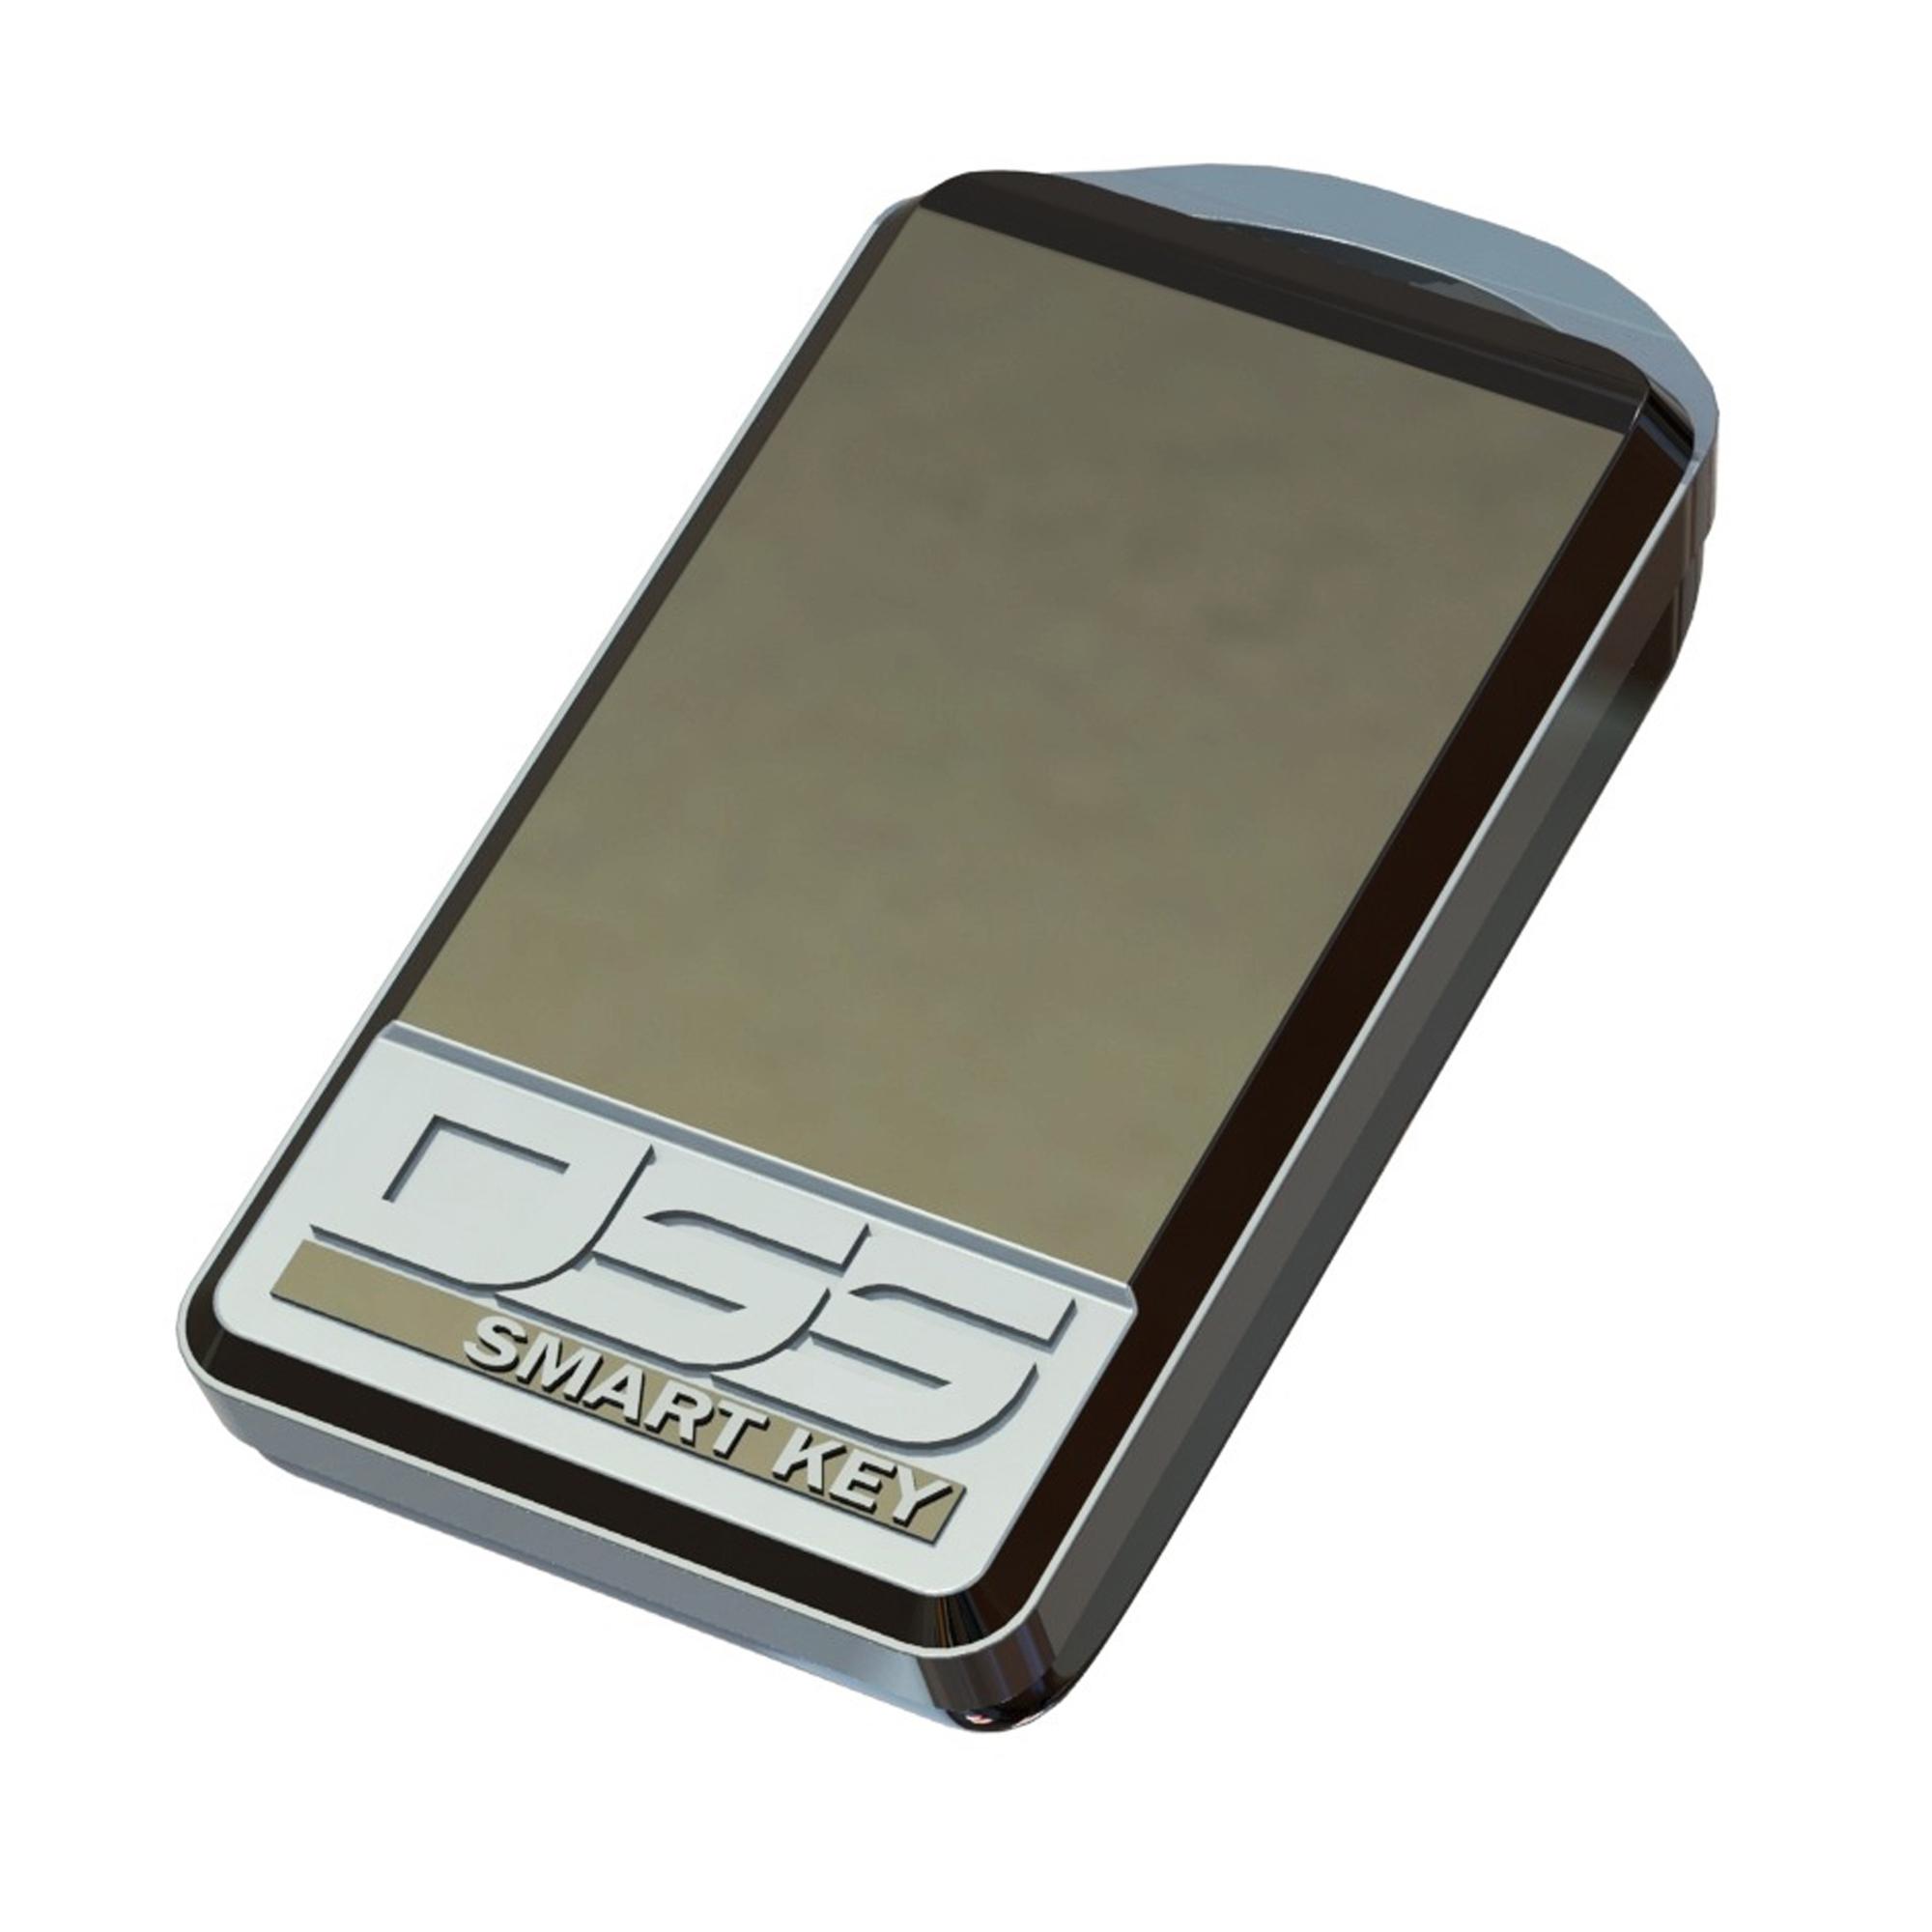 DSS Smart Key Seri *HS - Alarm Motor - Pengaman Motor - Keyless Motor